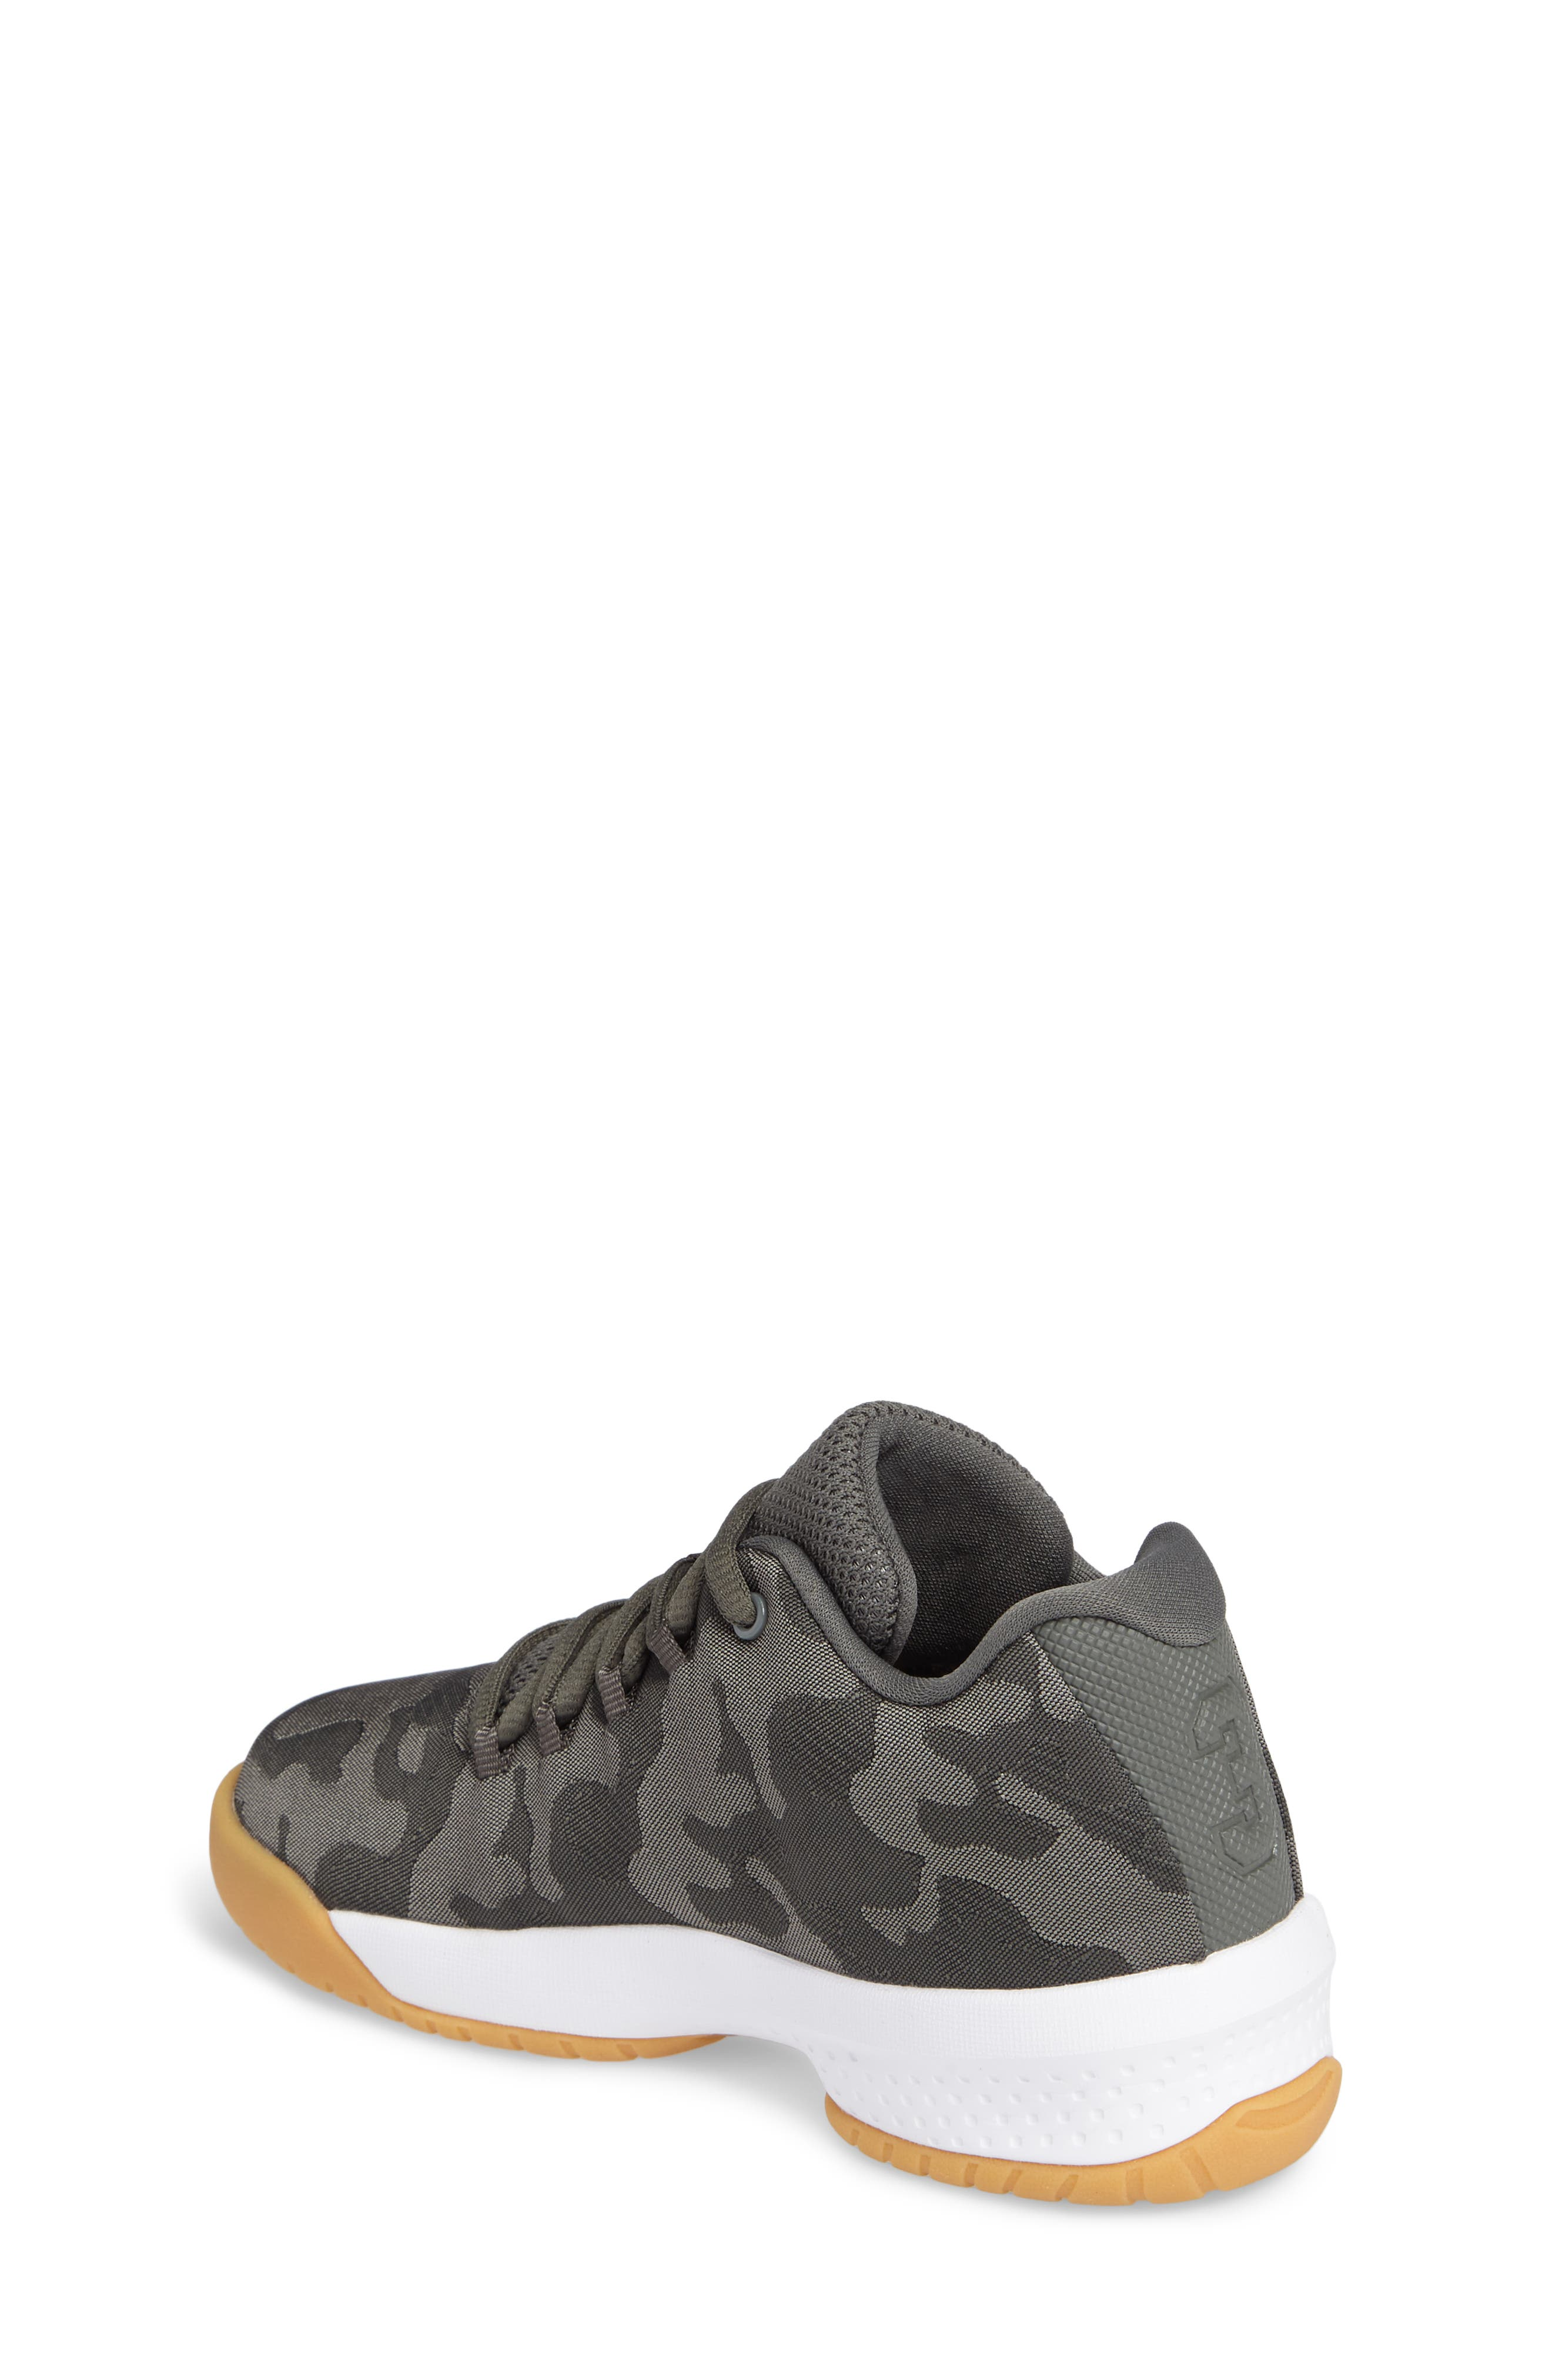 B. Fly Basketball Shoe,                             Alternate thumbnail 2, color,                             250